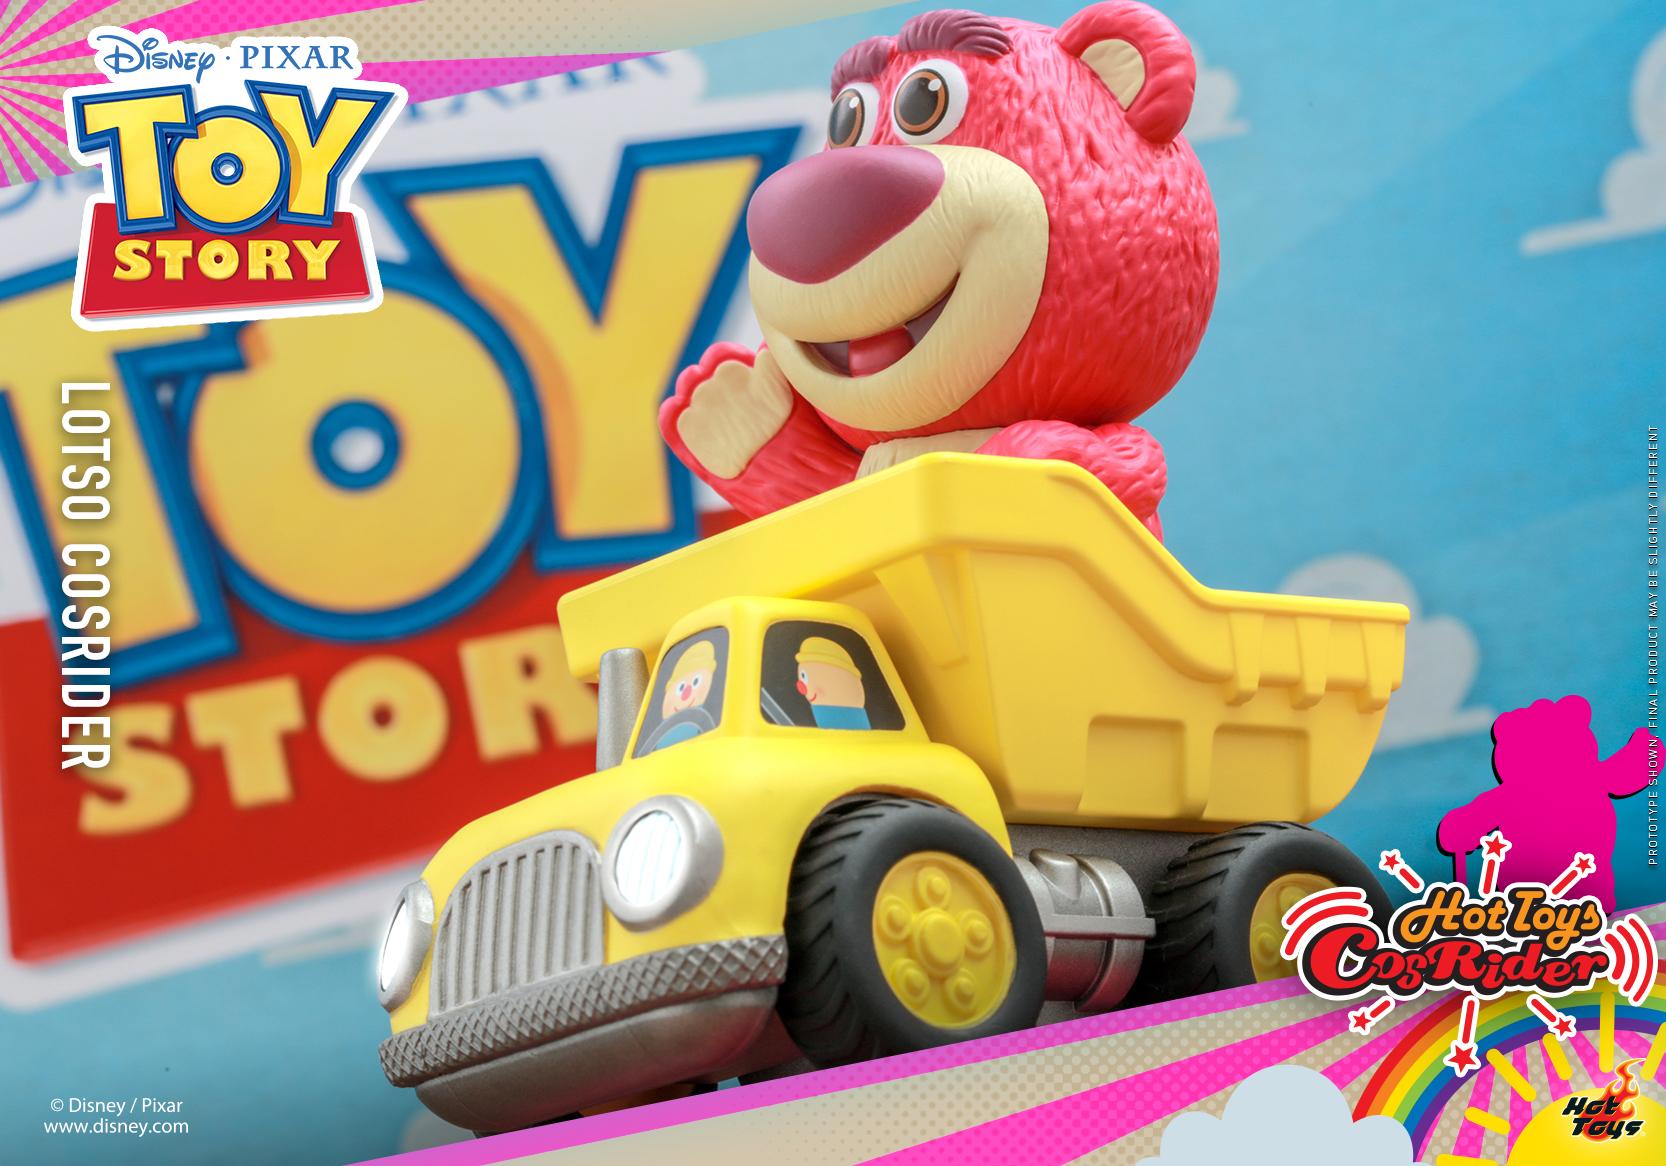 Hot Toys - Toy Story - Lotso CosRider_PR3